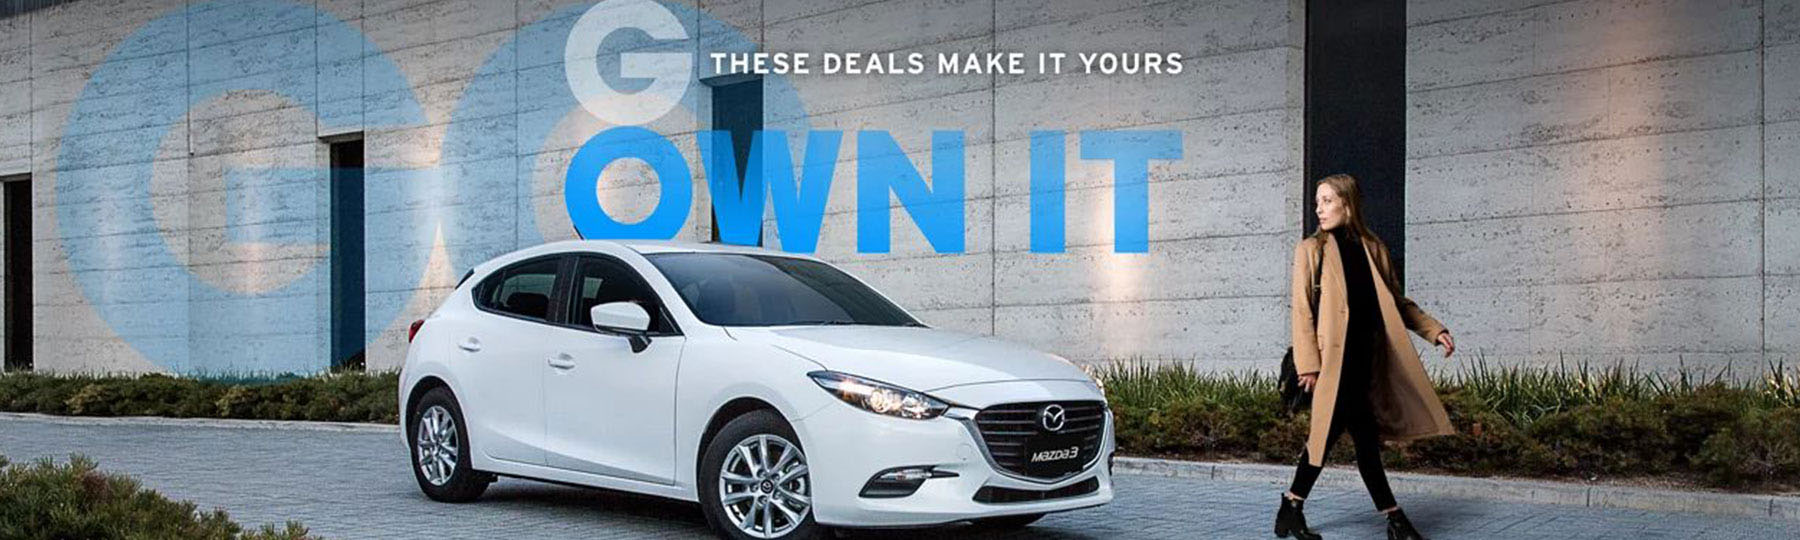 Mazda - Go Own It